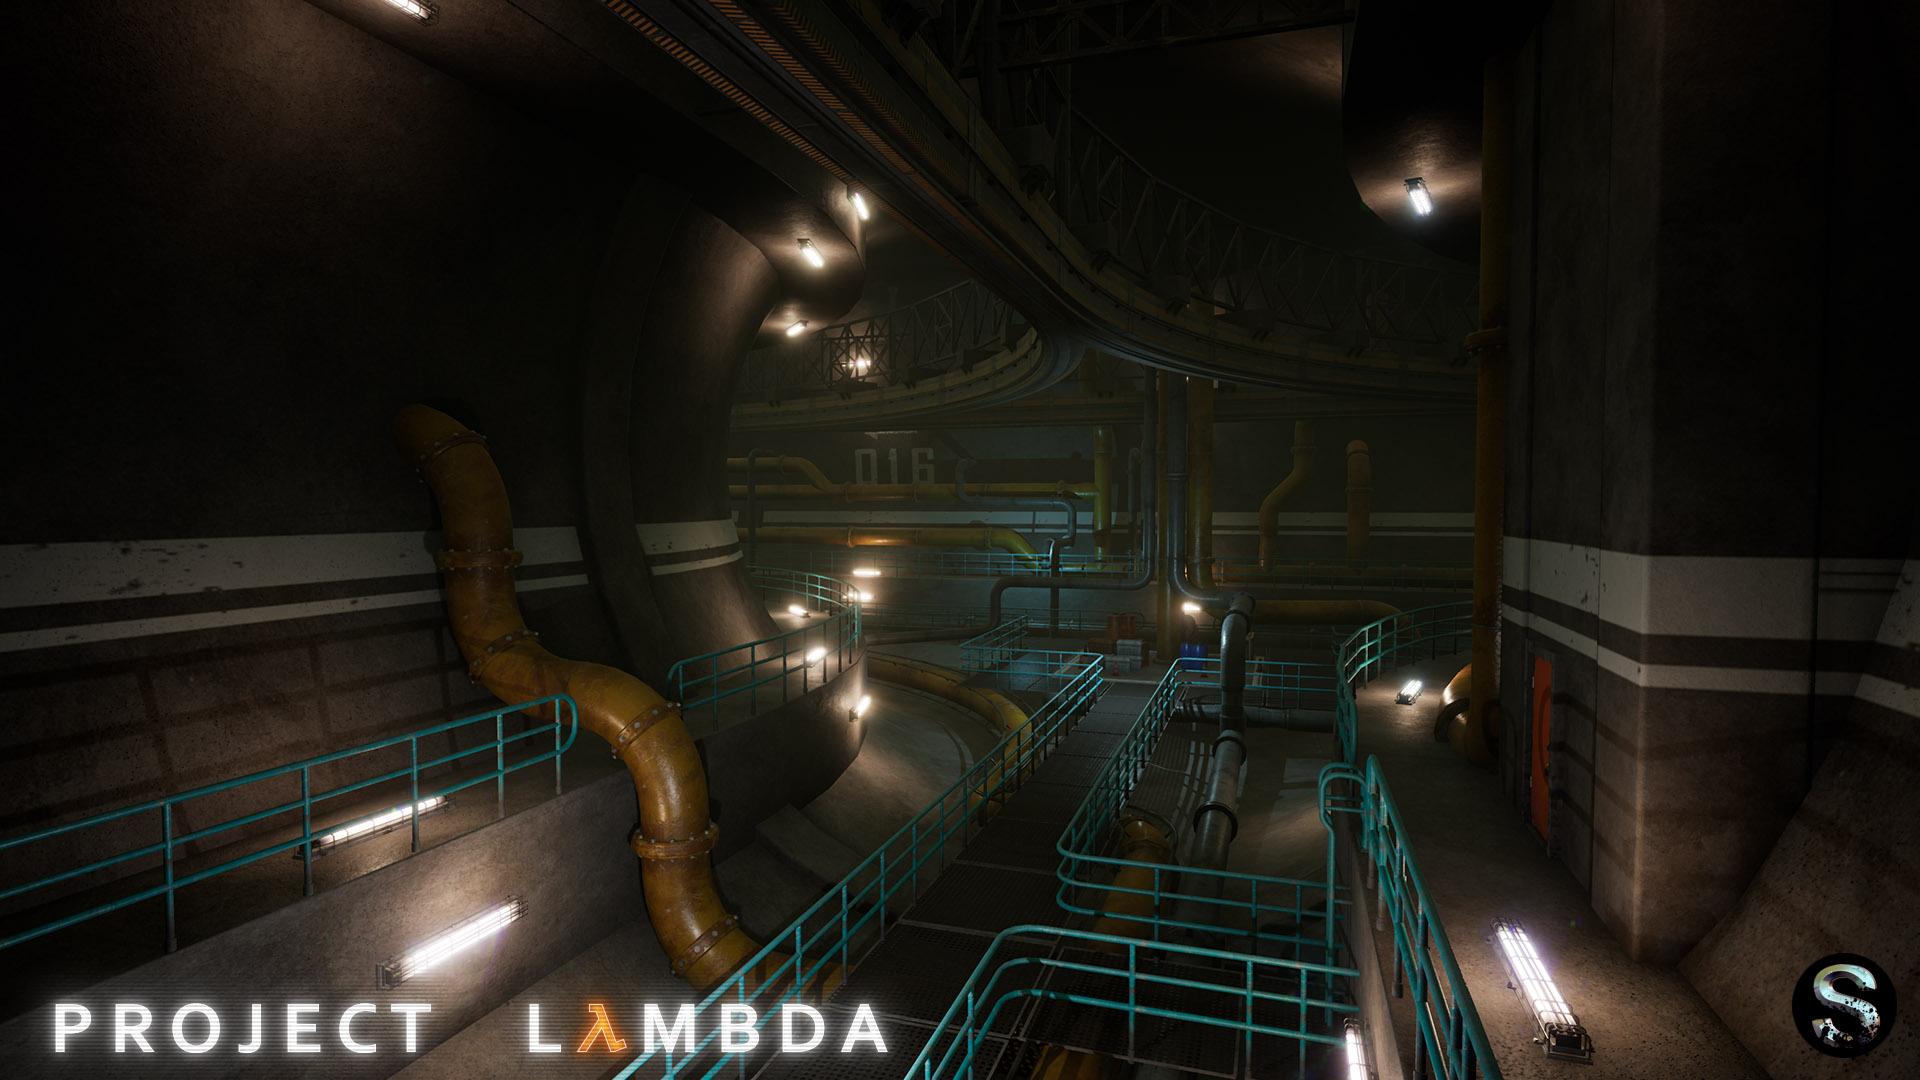 Фанаты опубликовали скриншоты ремейка Half-Life на Unreal Engine 4